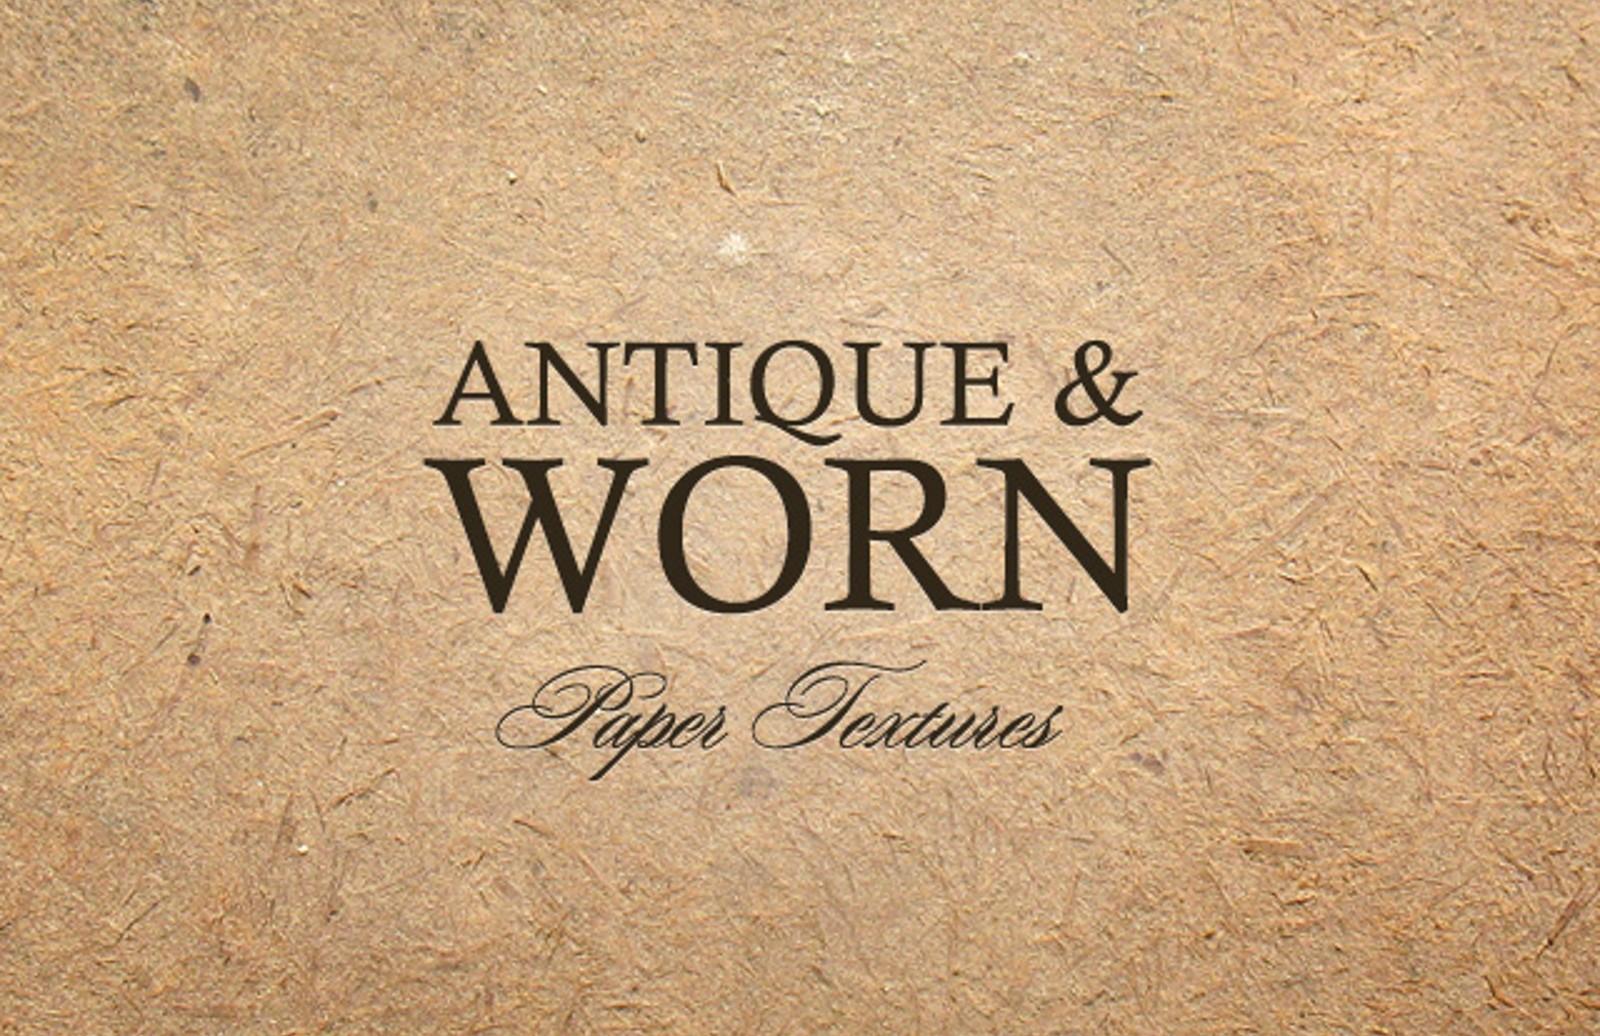 Antique  Worn  Paper  Textures  Preview1